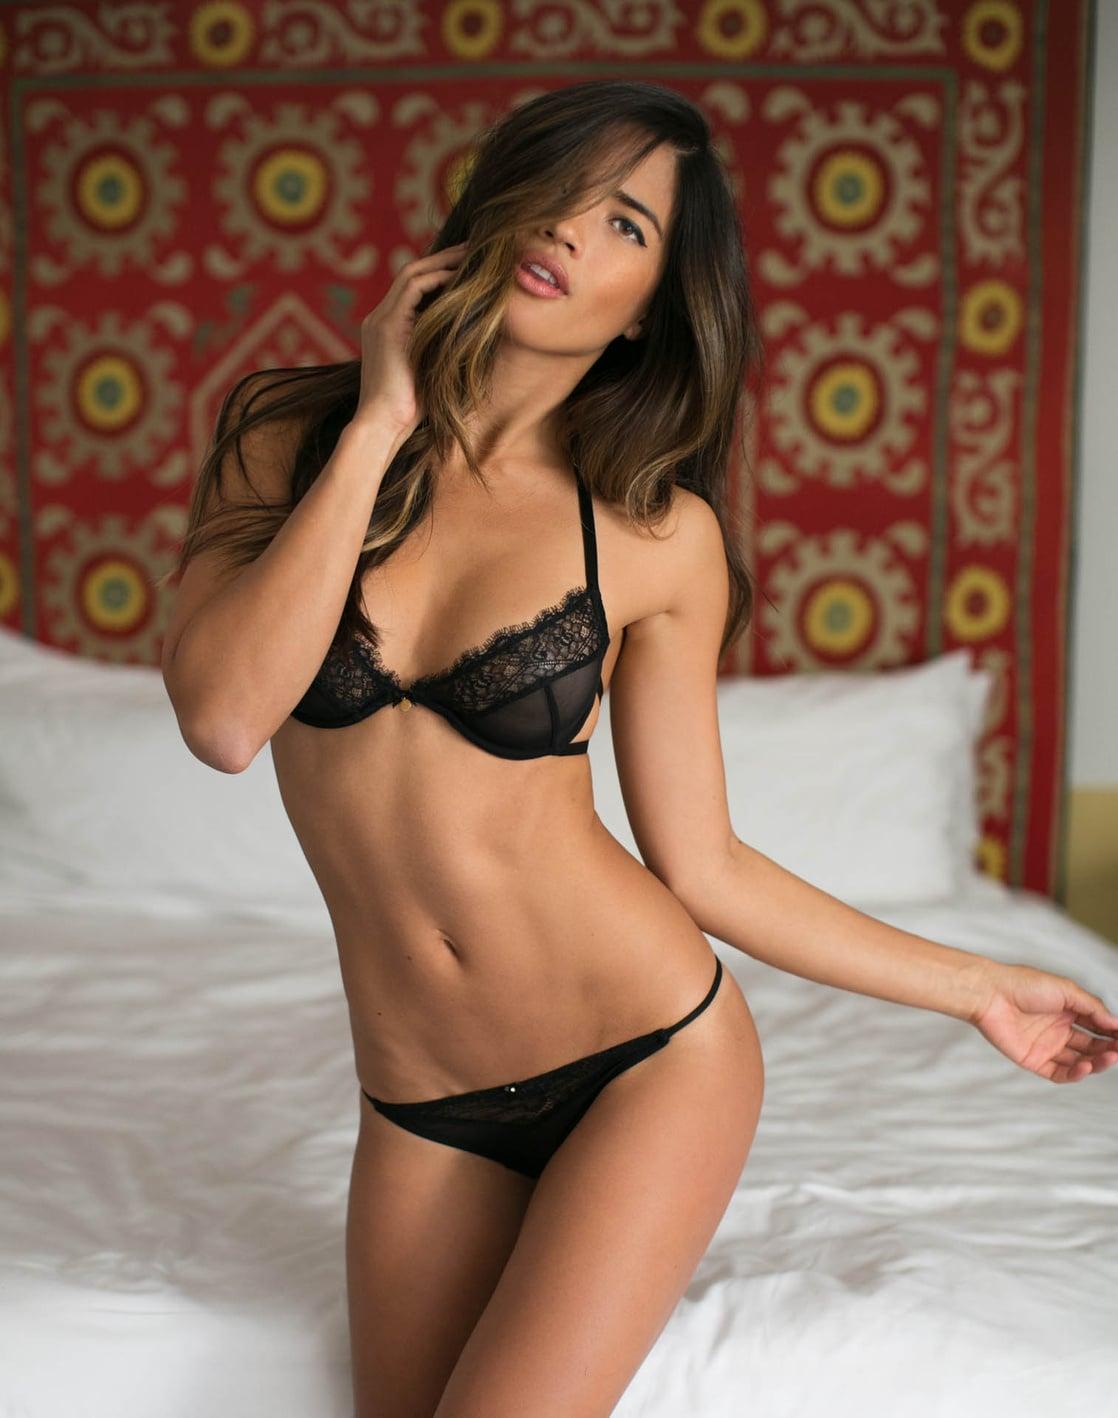 TheFappening Carmella Rose nude photos 2019